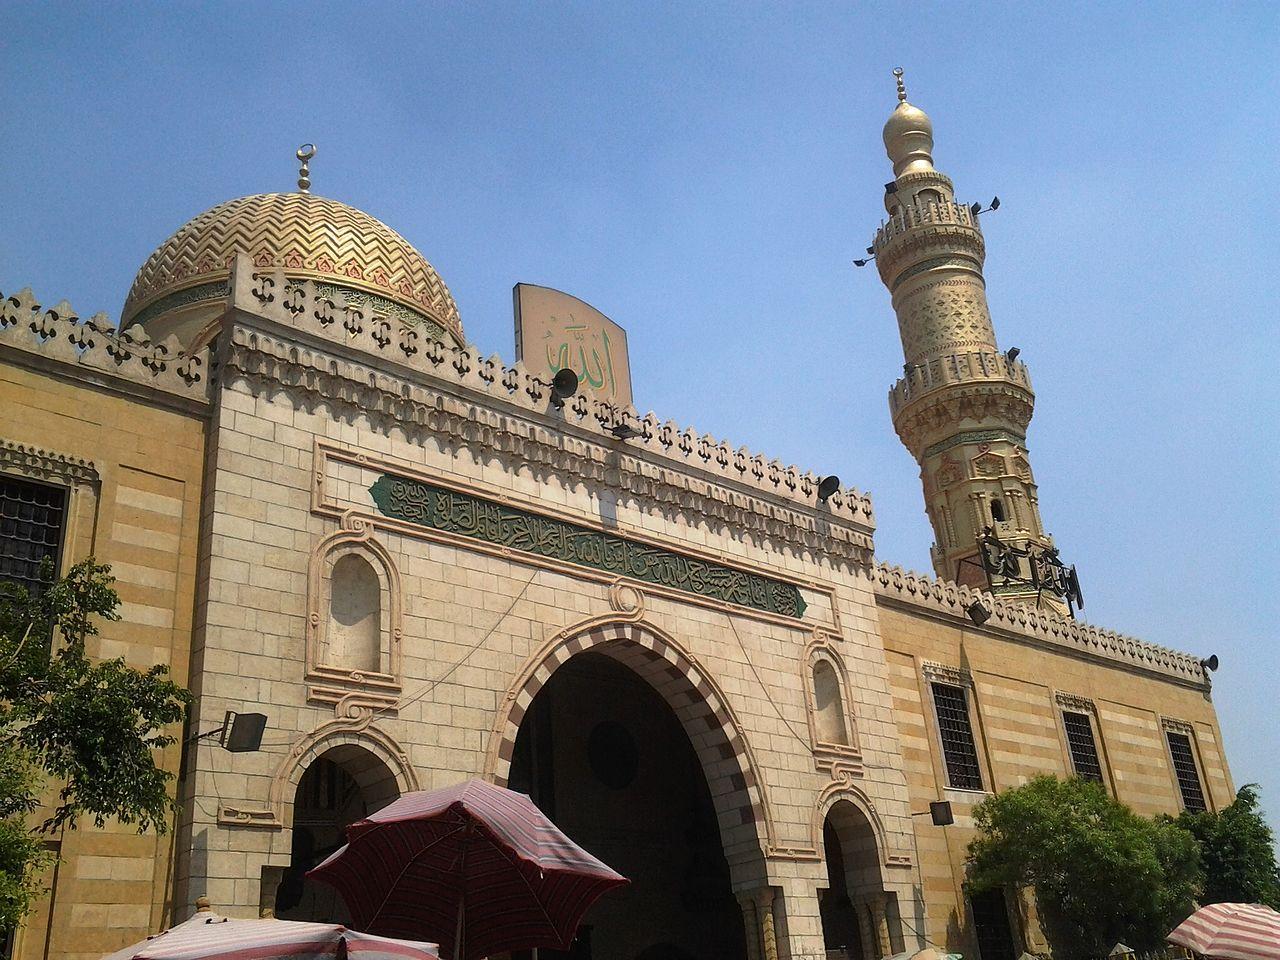 Sayyidah Nafisah: The Saintly Lady of Egypt